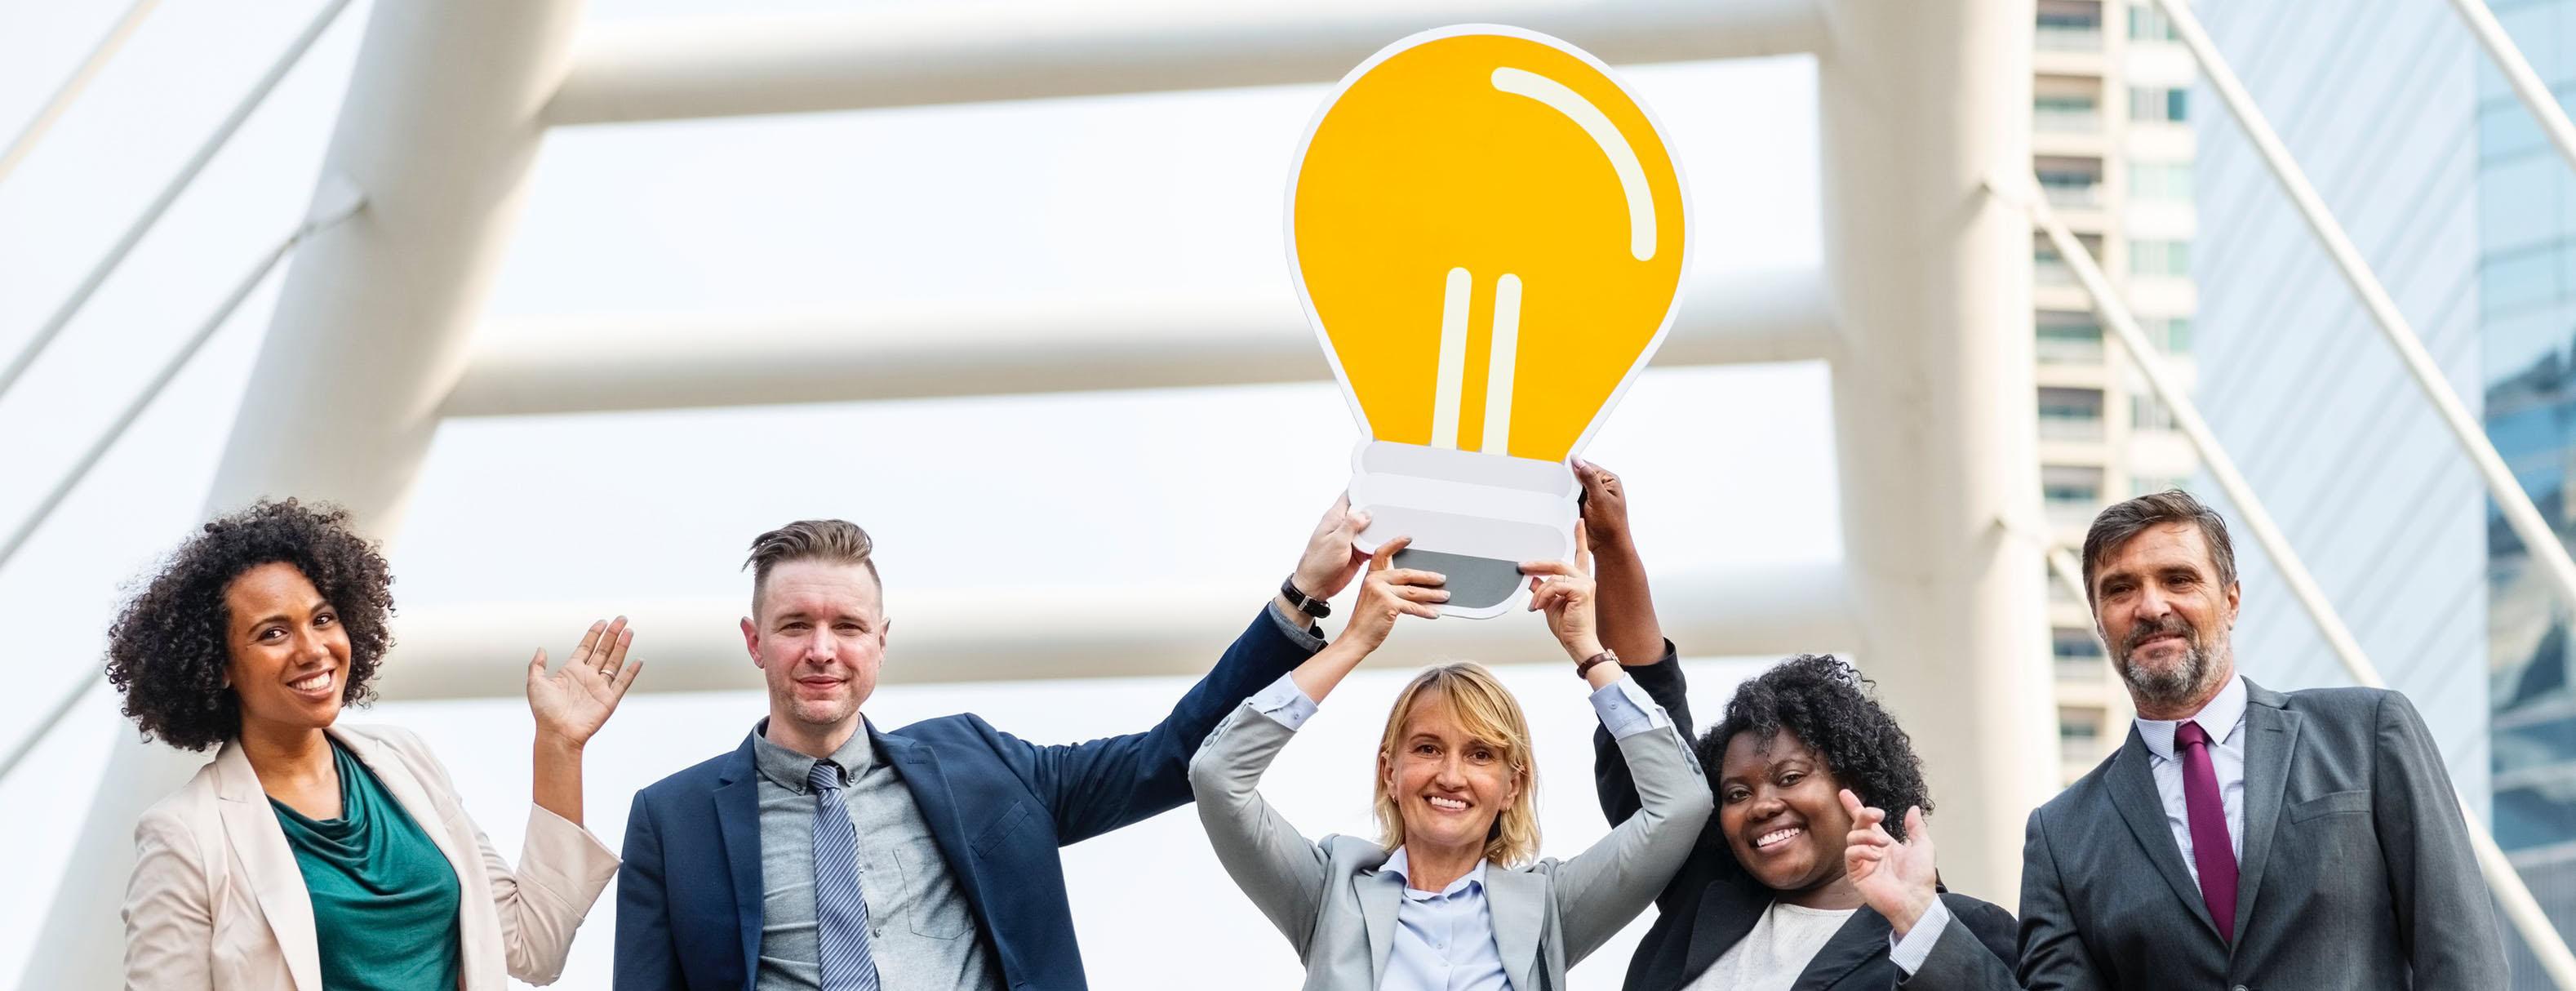 tehokkaampi-talent-acquisiton-prosessi